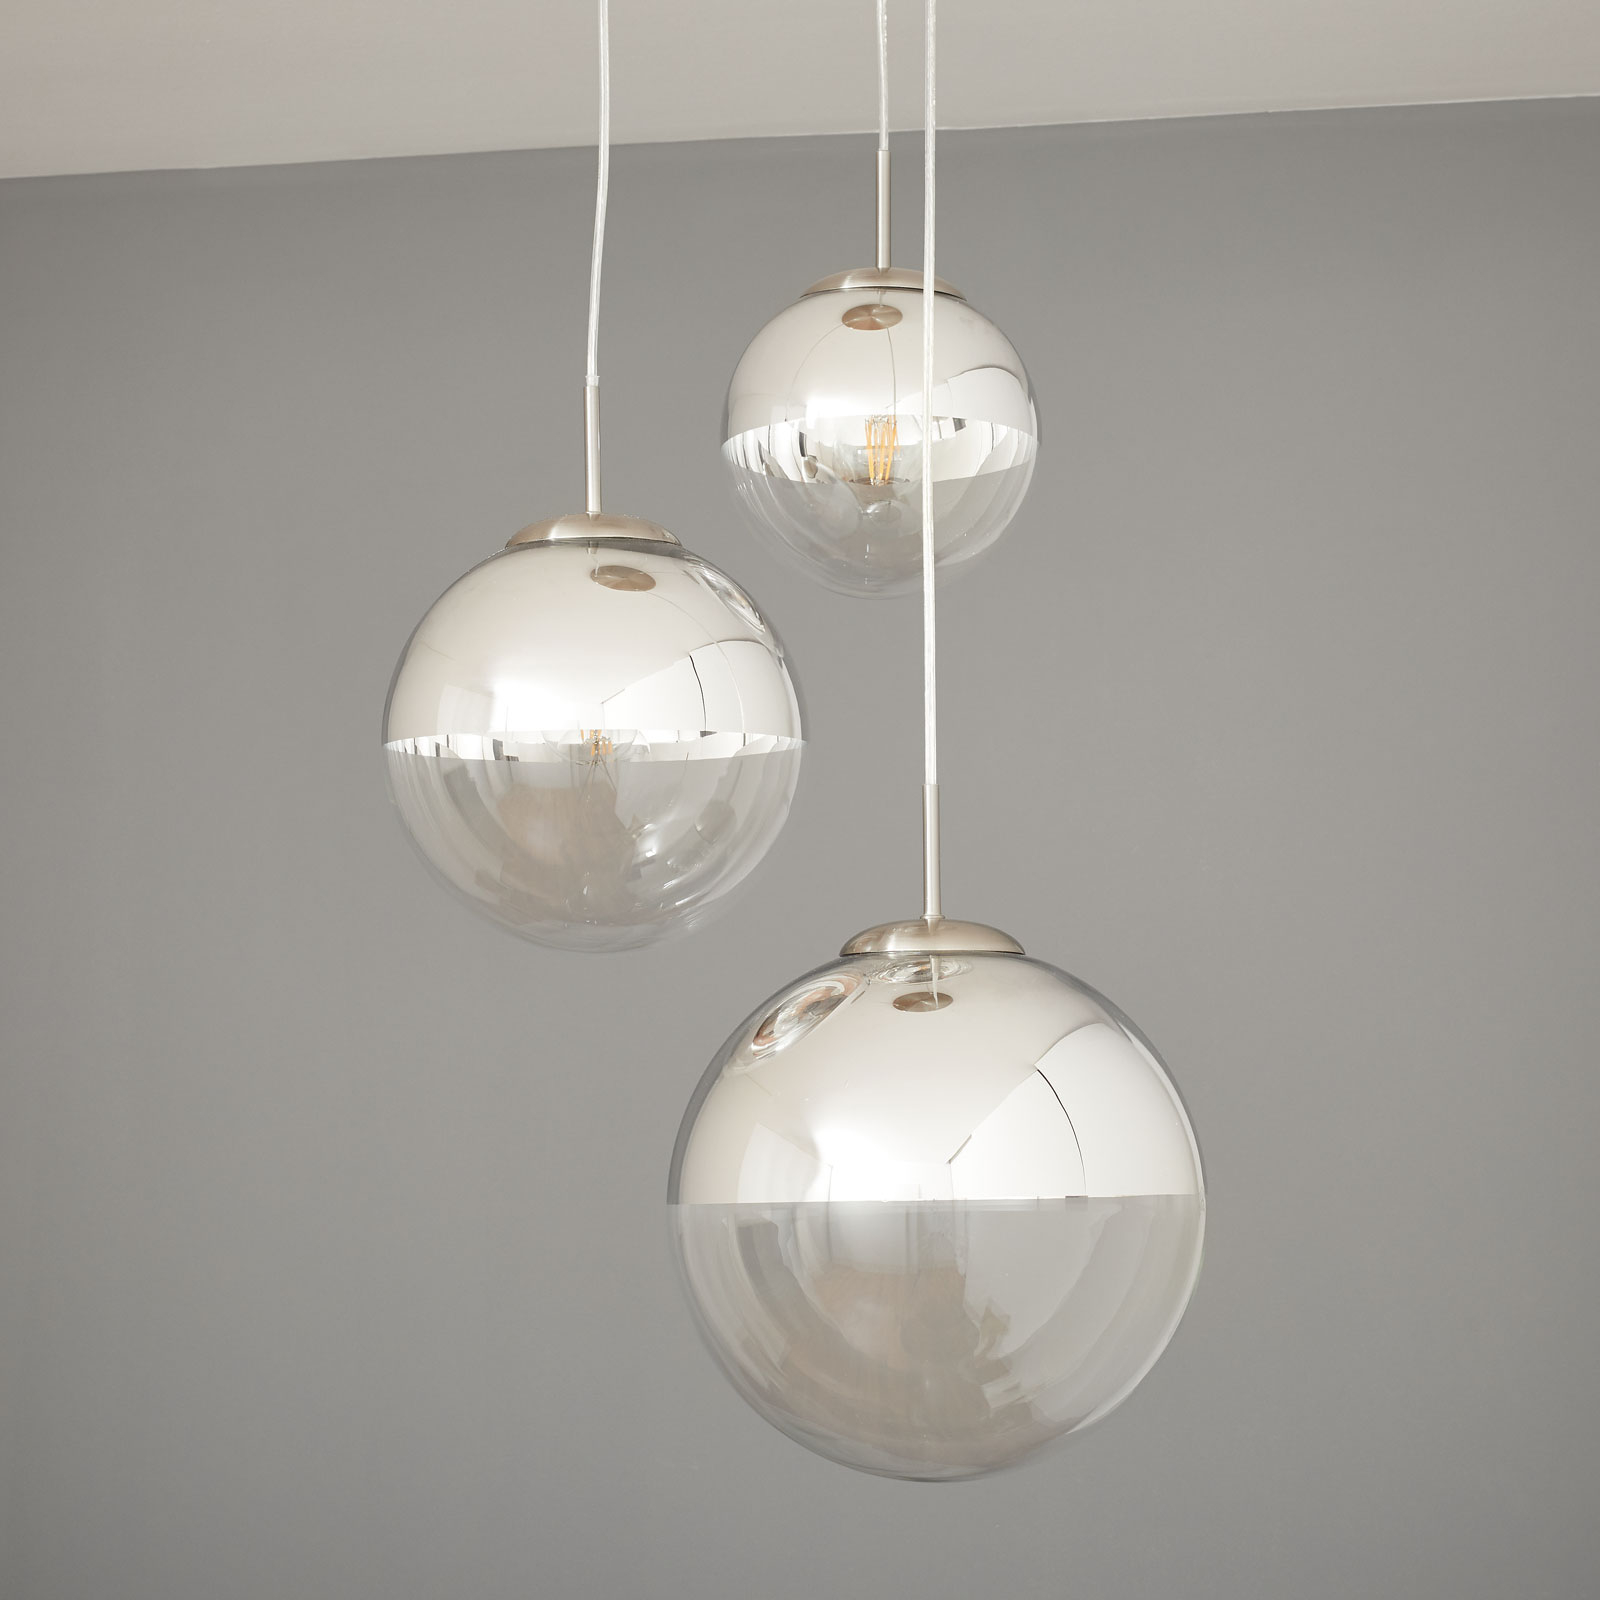 Pendellampe Ravena med glasskuler, 3 lyskilder